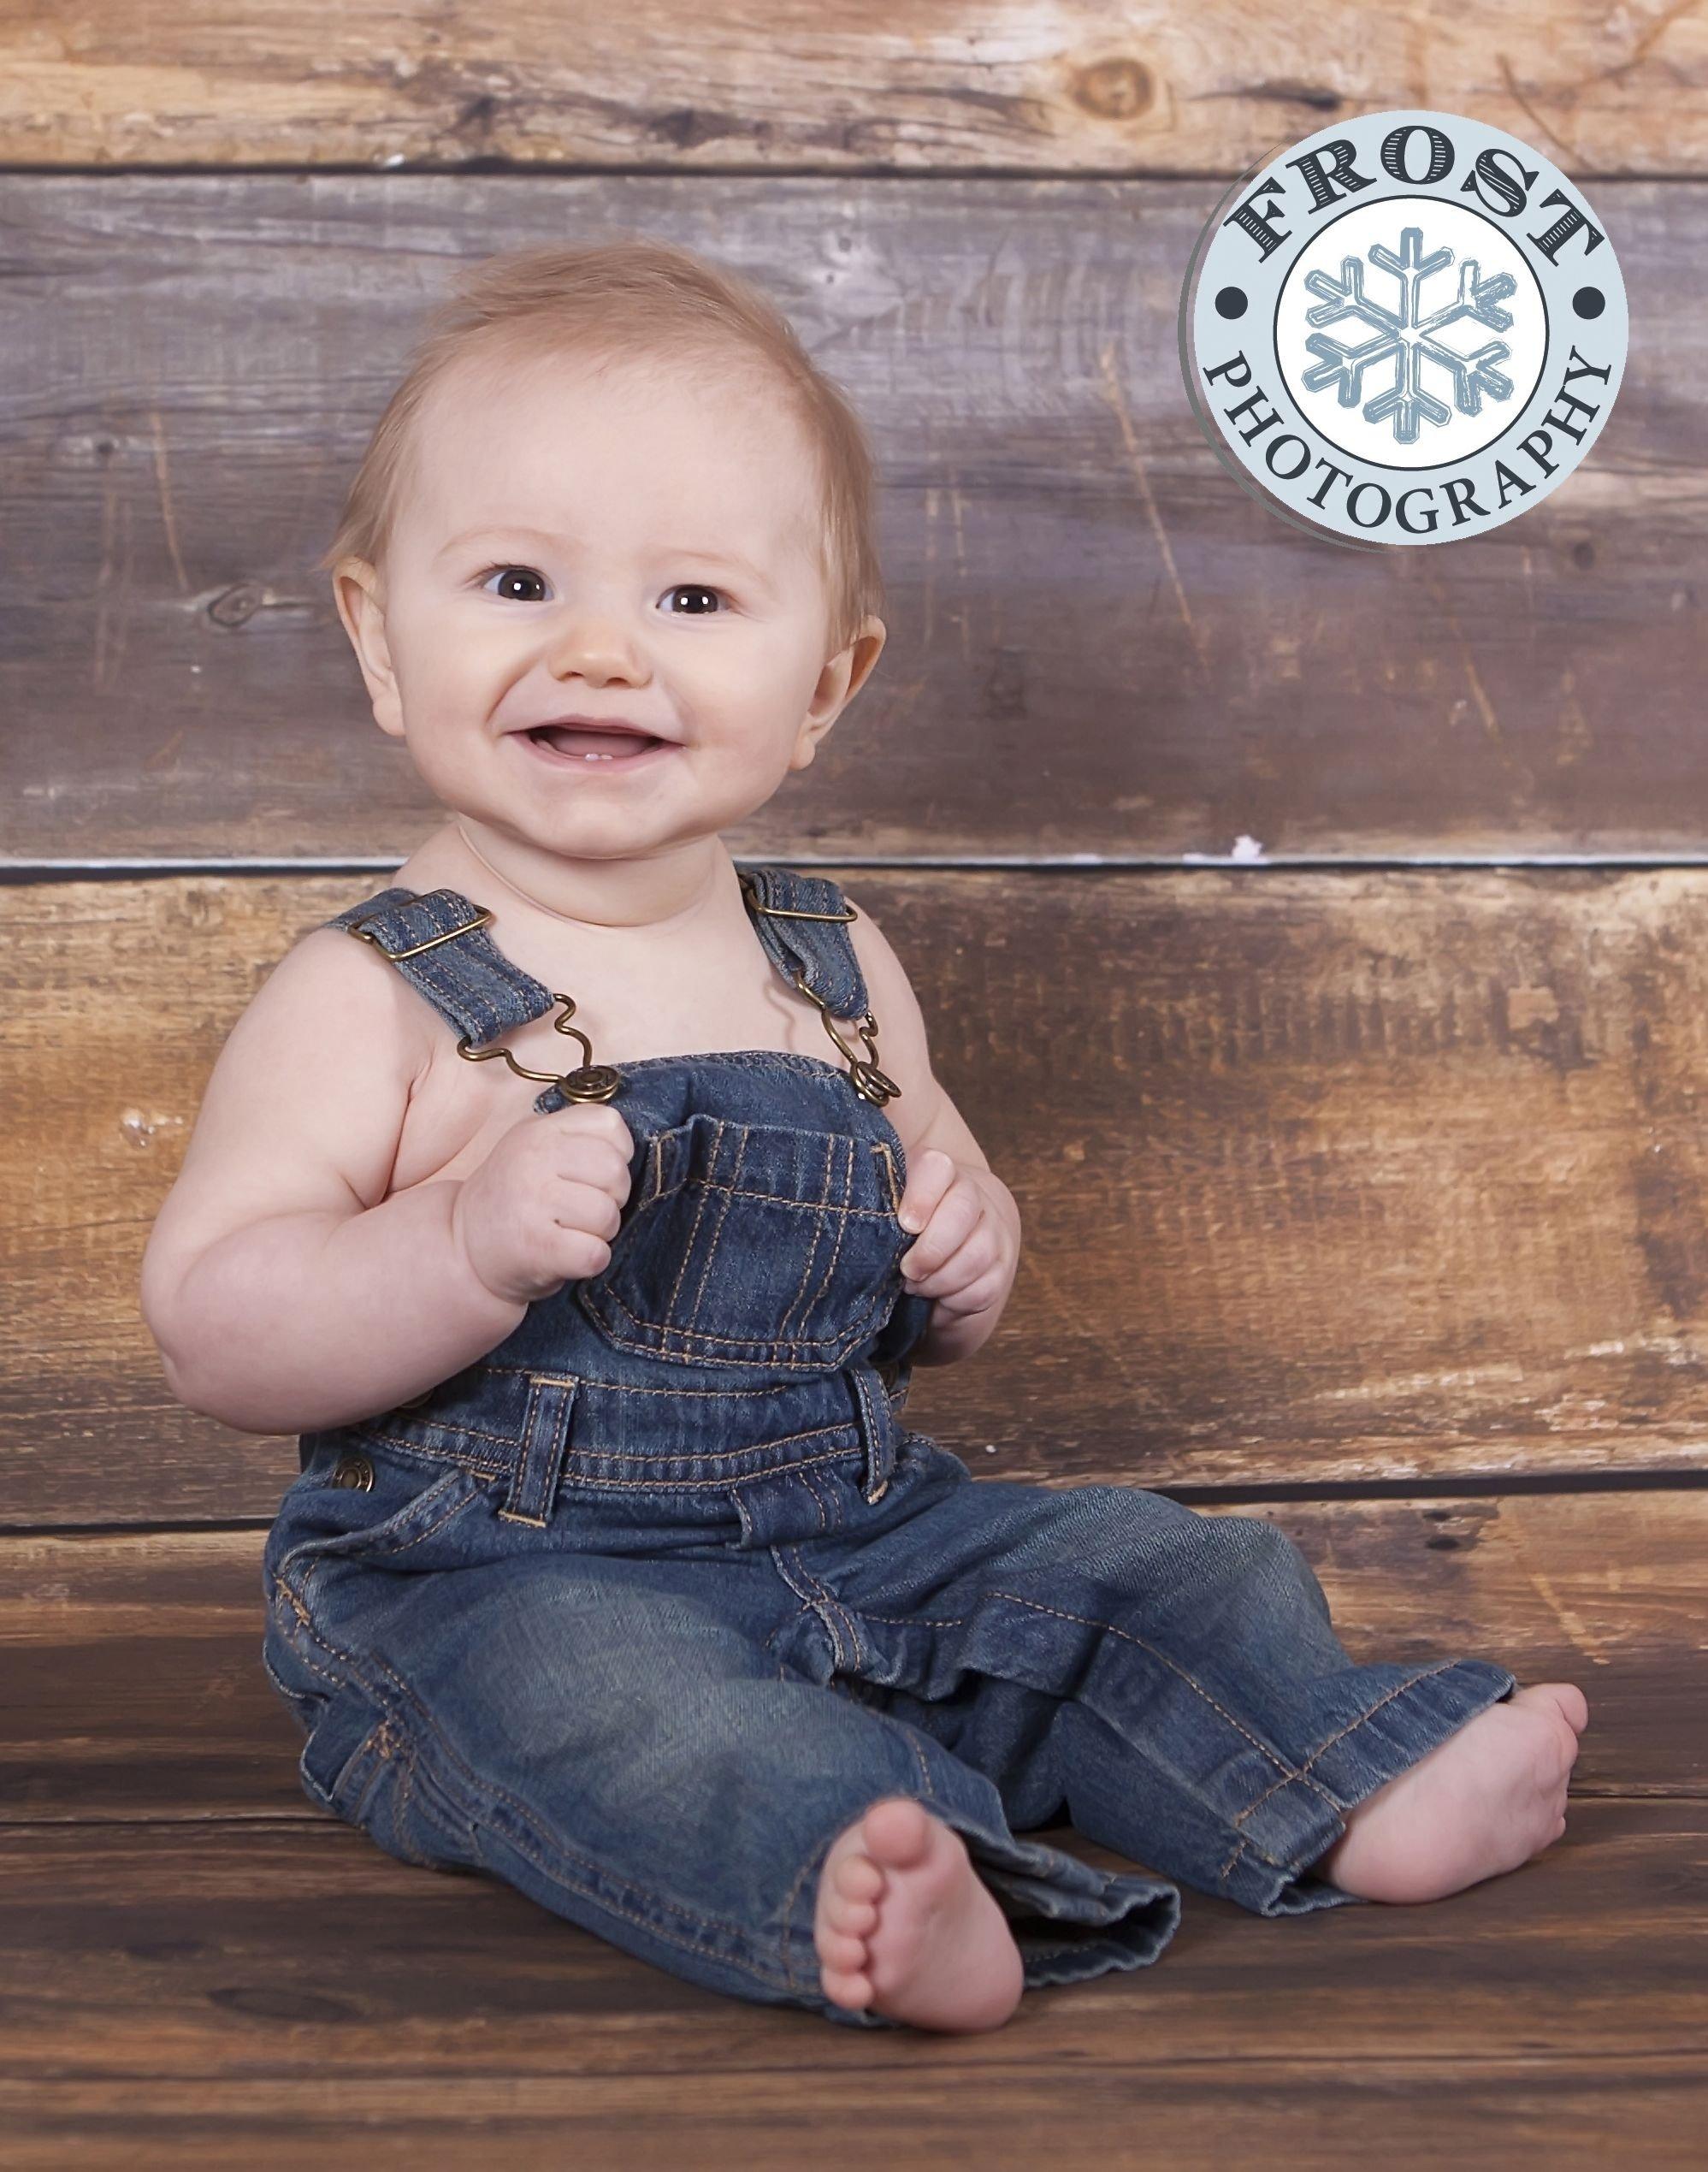 10 Wonderful 6 Month Baby Boy Photo Ideas 6 month baby boy overalls portrait google search picture ideas 1 2020